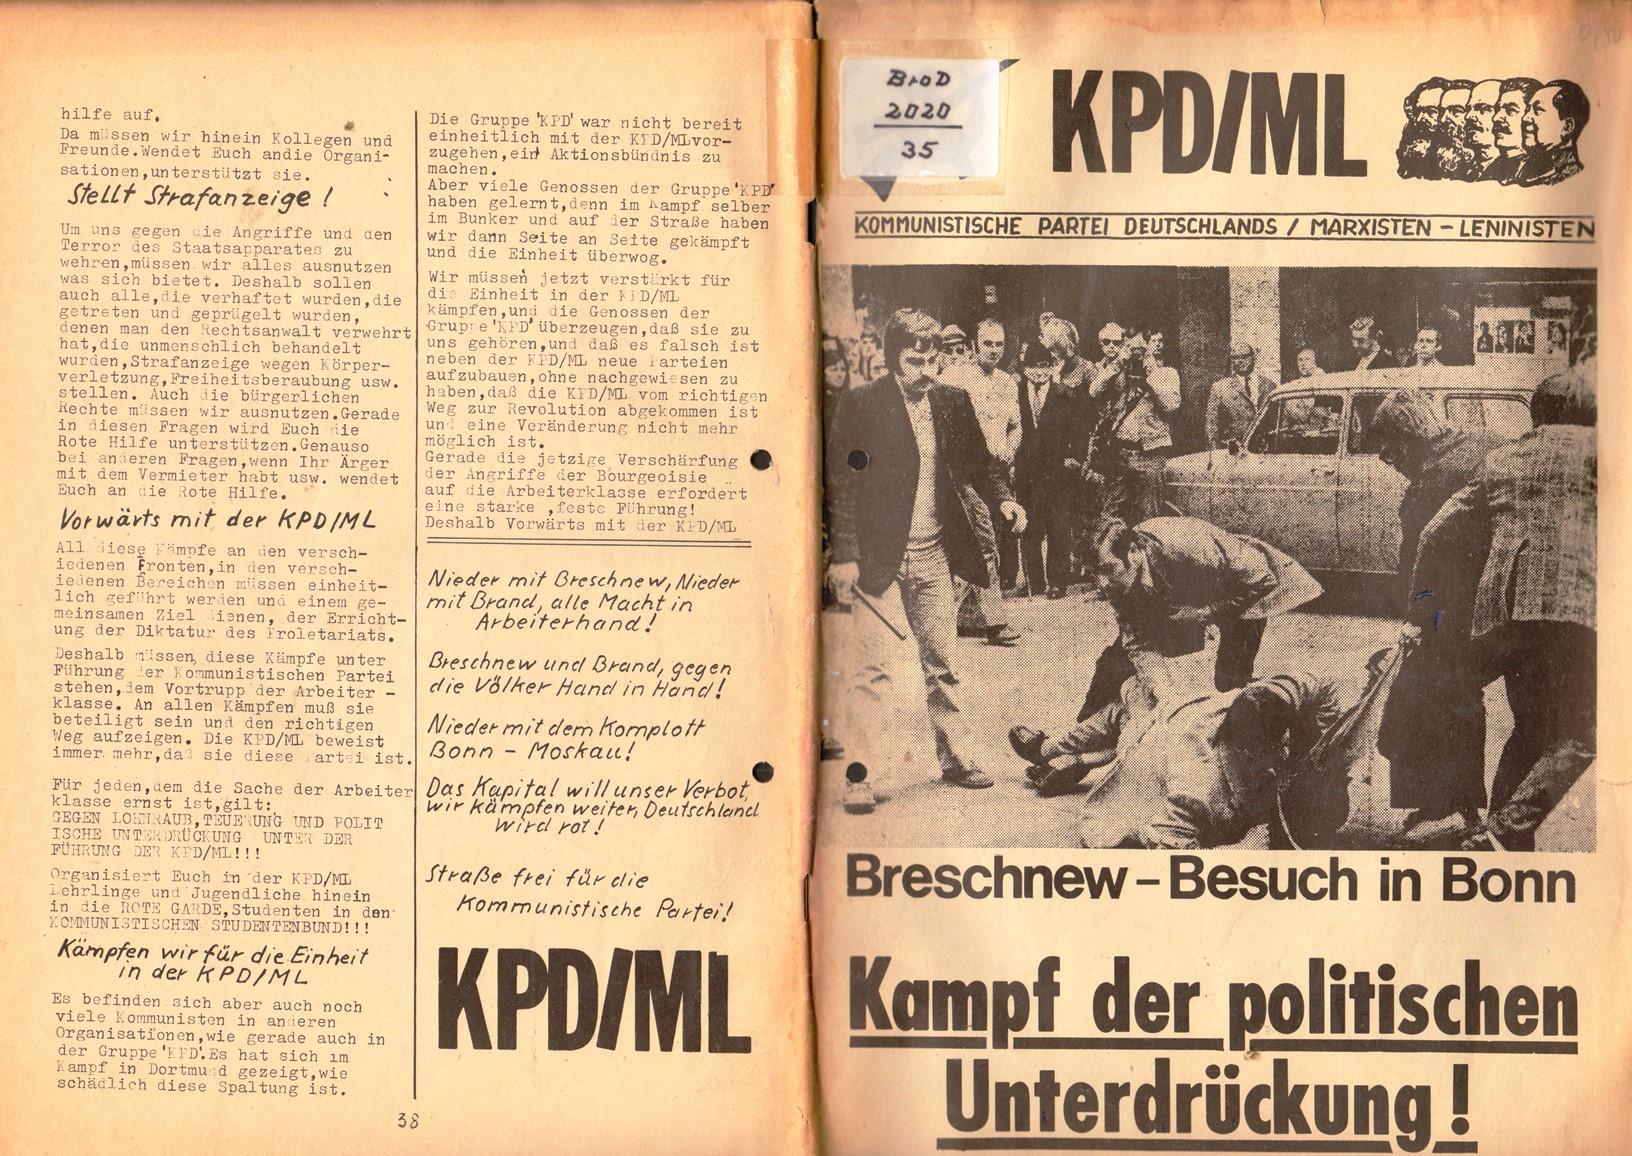 KPDML_1973_Breschnew_Besuch_in_Bonn_01